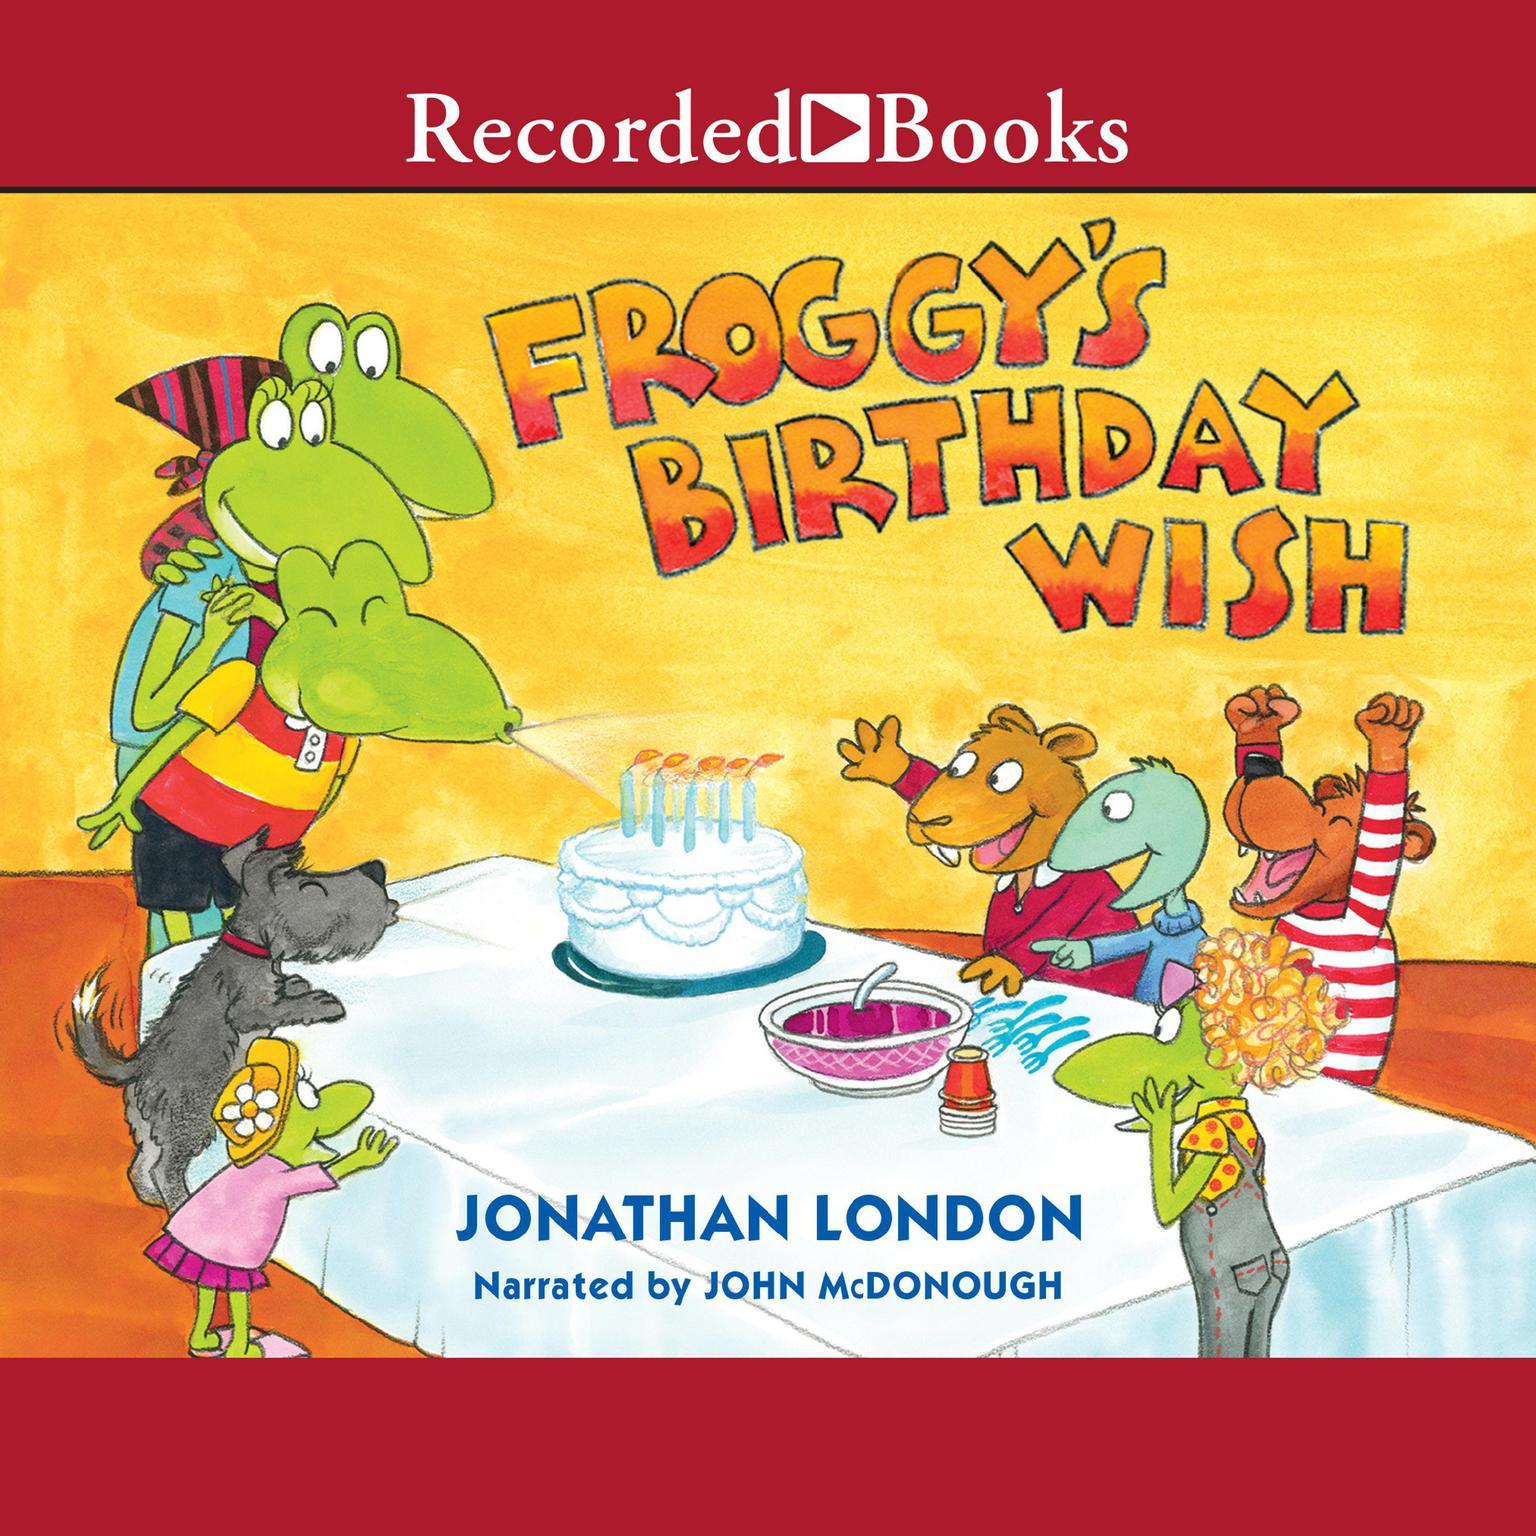 Froggys Birthday Wish Audiobook, by Jonathan London